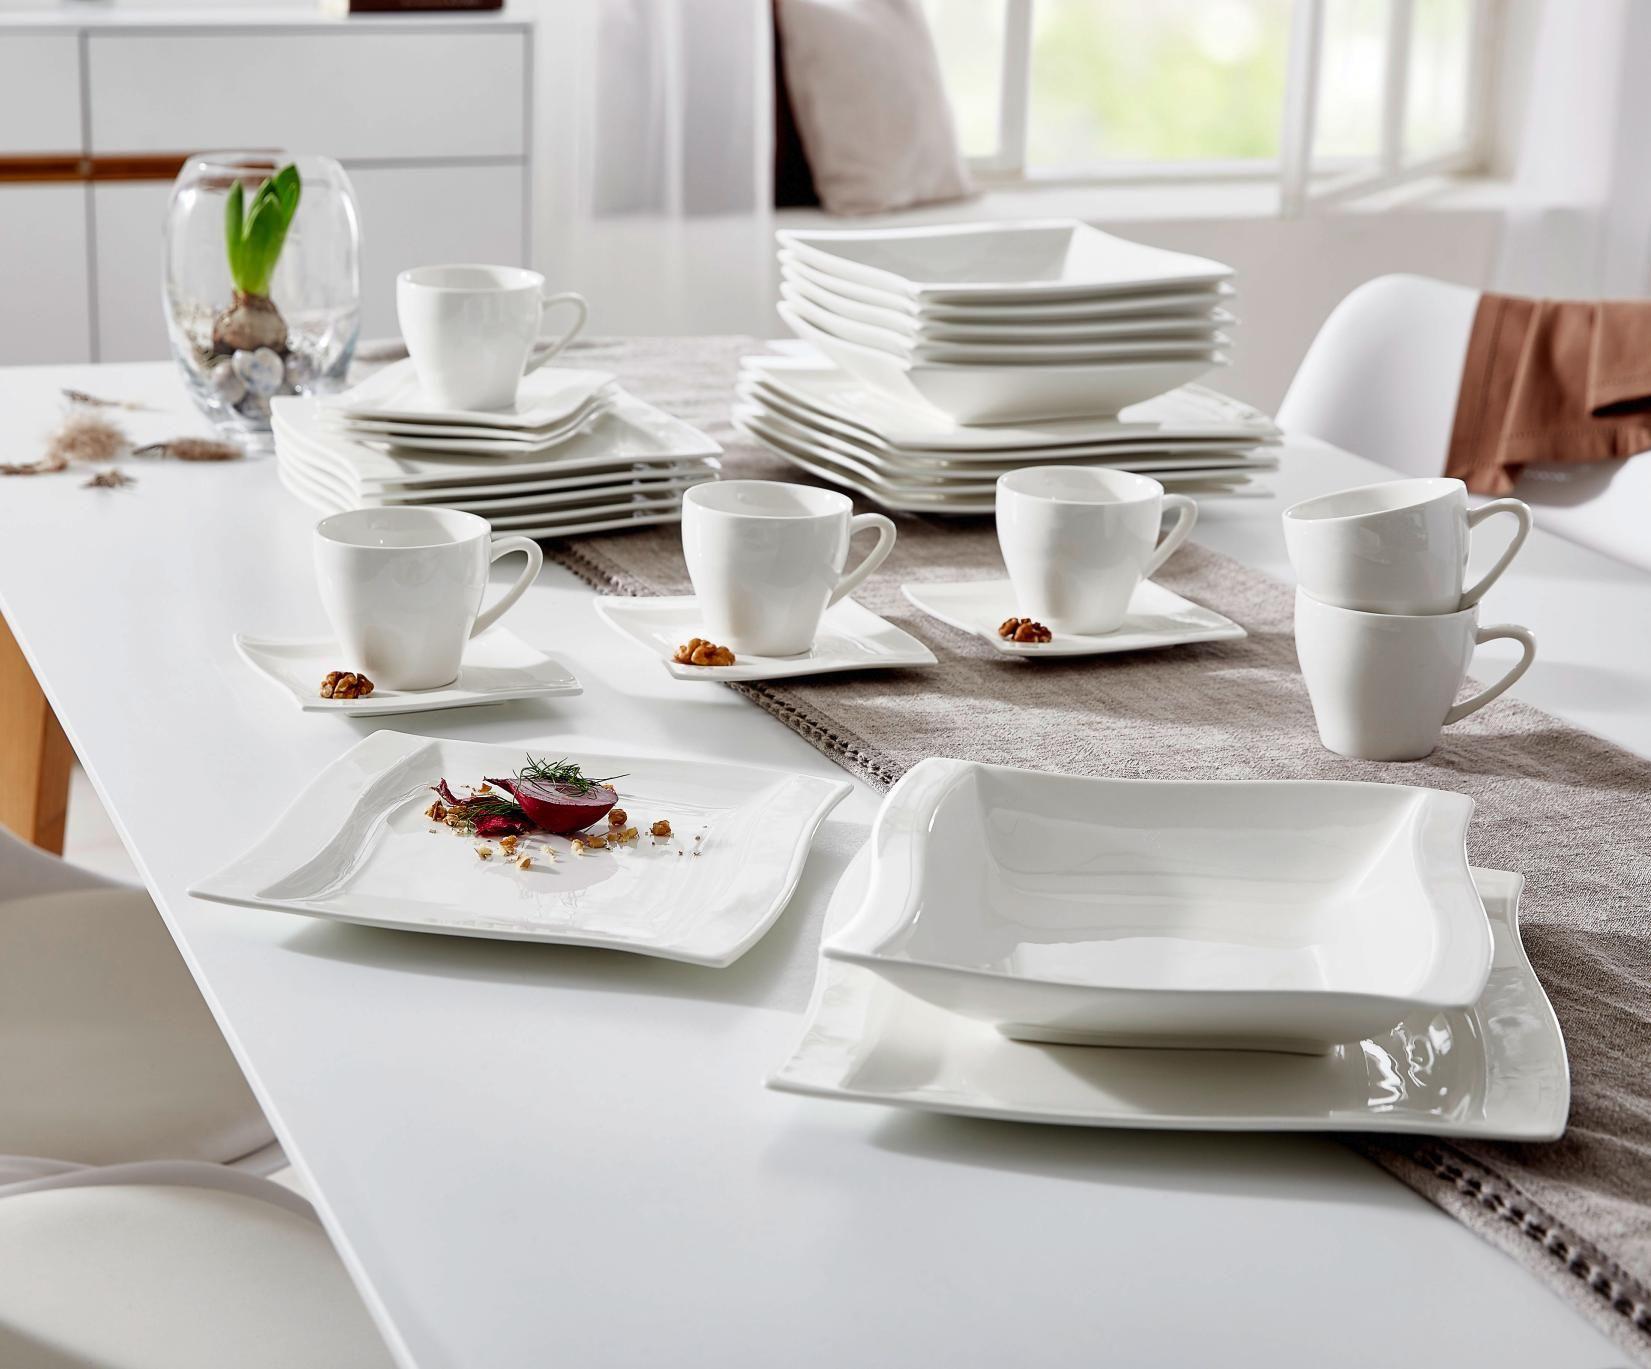 Tafelservice In Weiss Swing Quadratisch In Edlem Design Tafelservice Geschirr Geschirrset